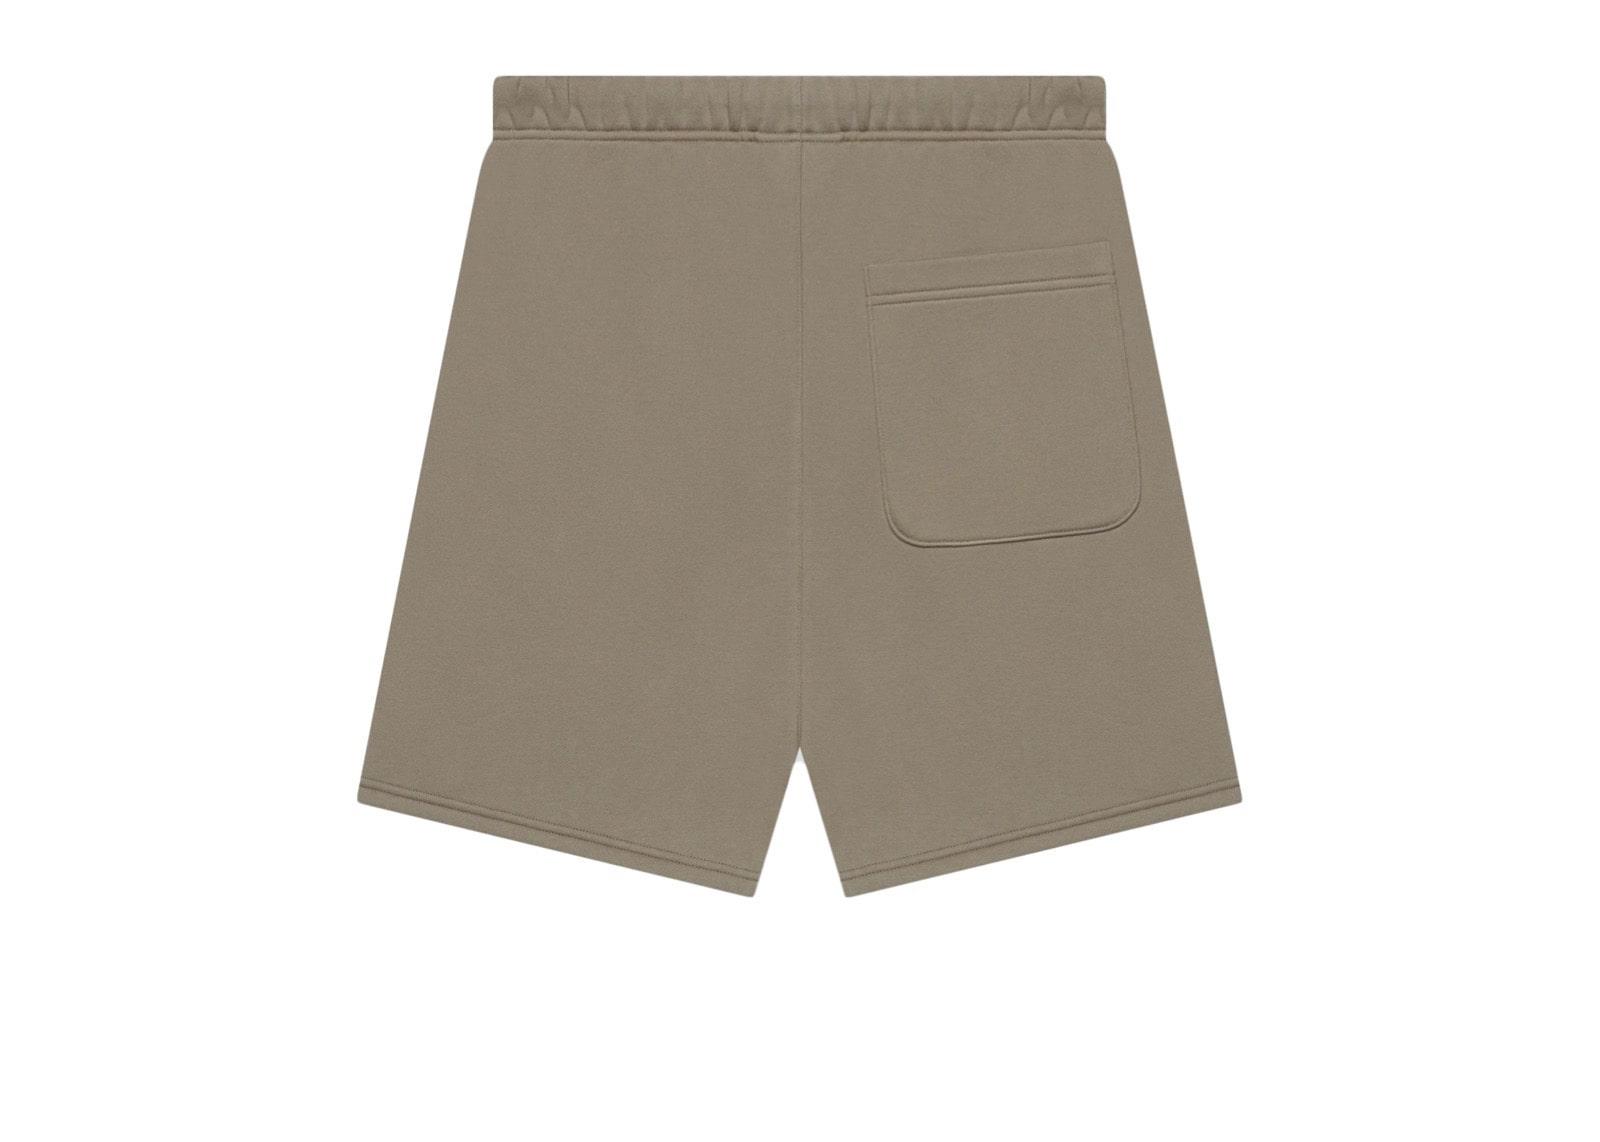 slide 2 - Taupe Shorts